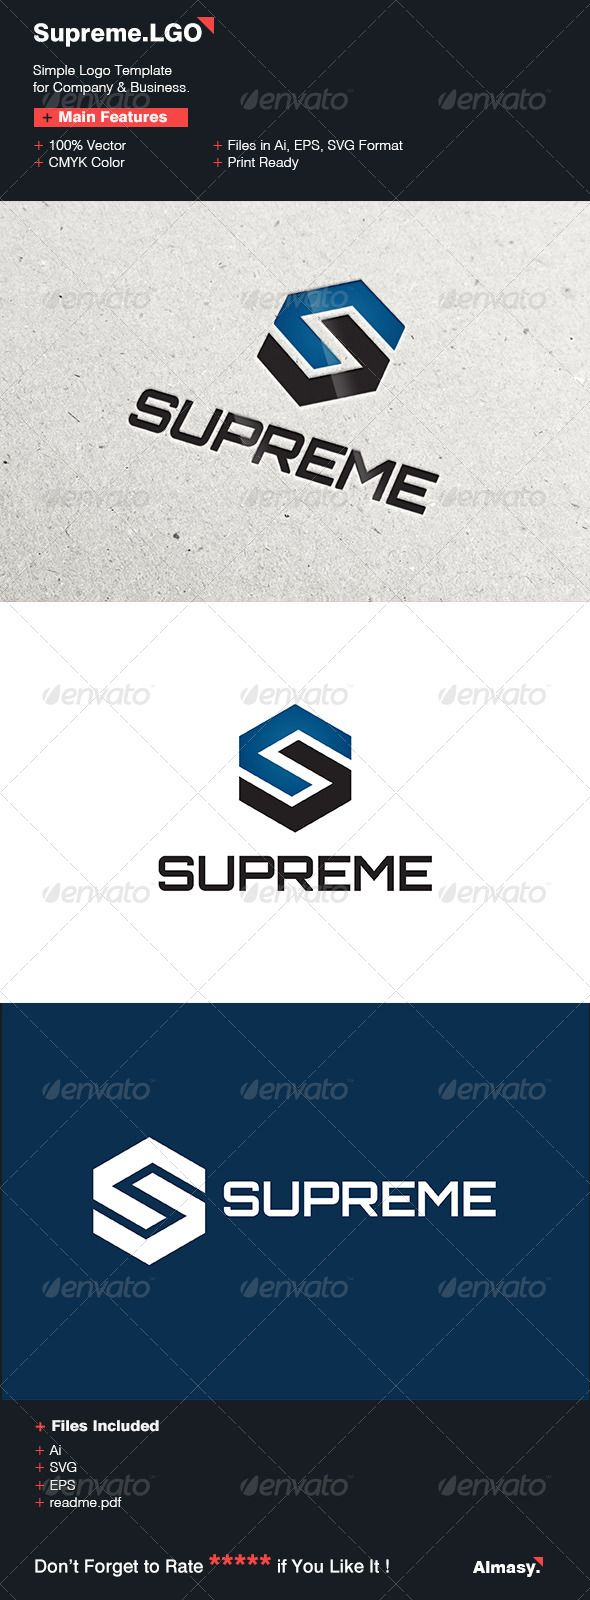 Supreme Logo Template Logo templates, Templates, Logos